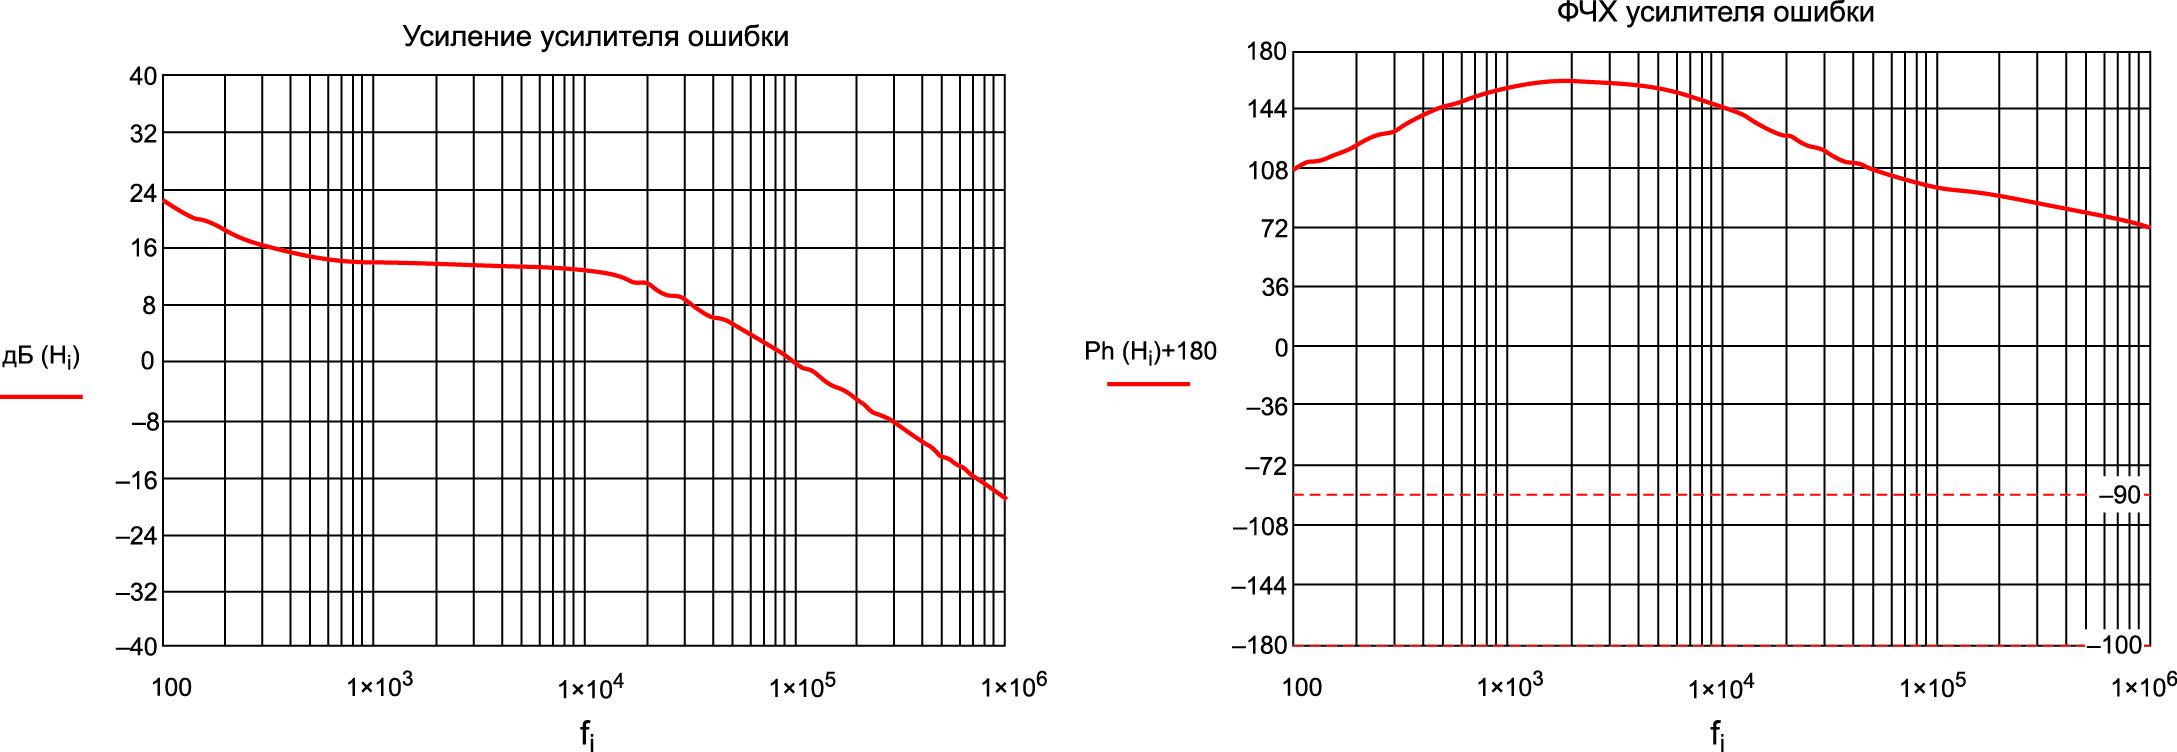 Графики усиления (АЧХ) и ФЧХ усилителя ошибки